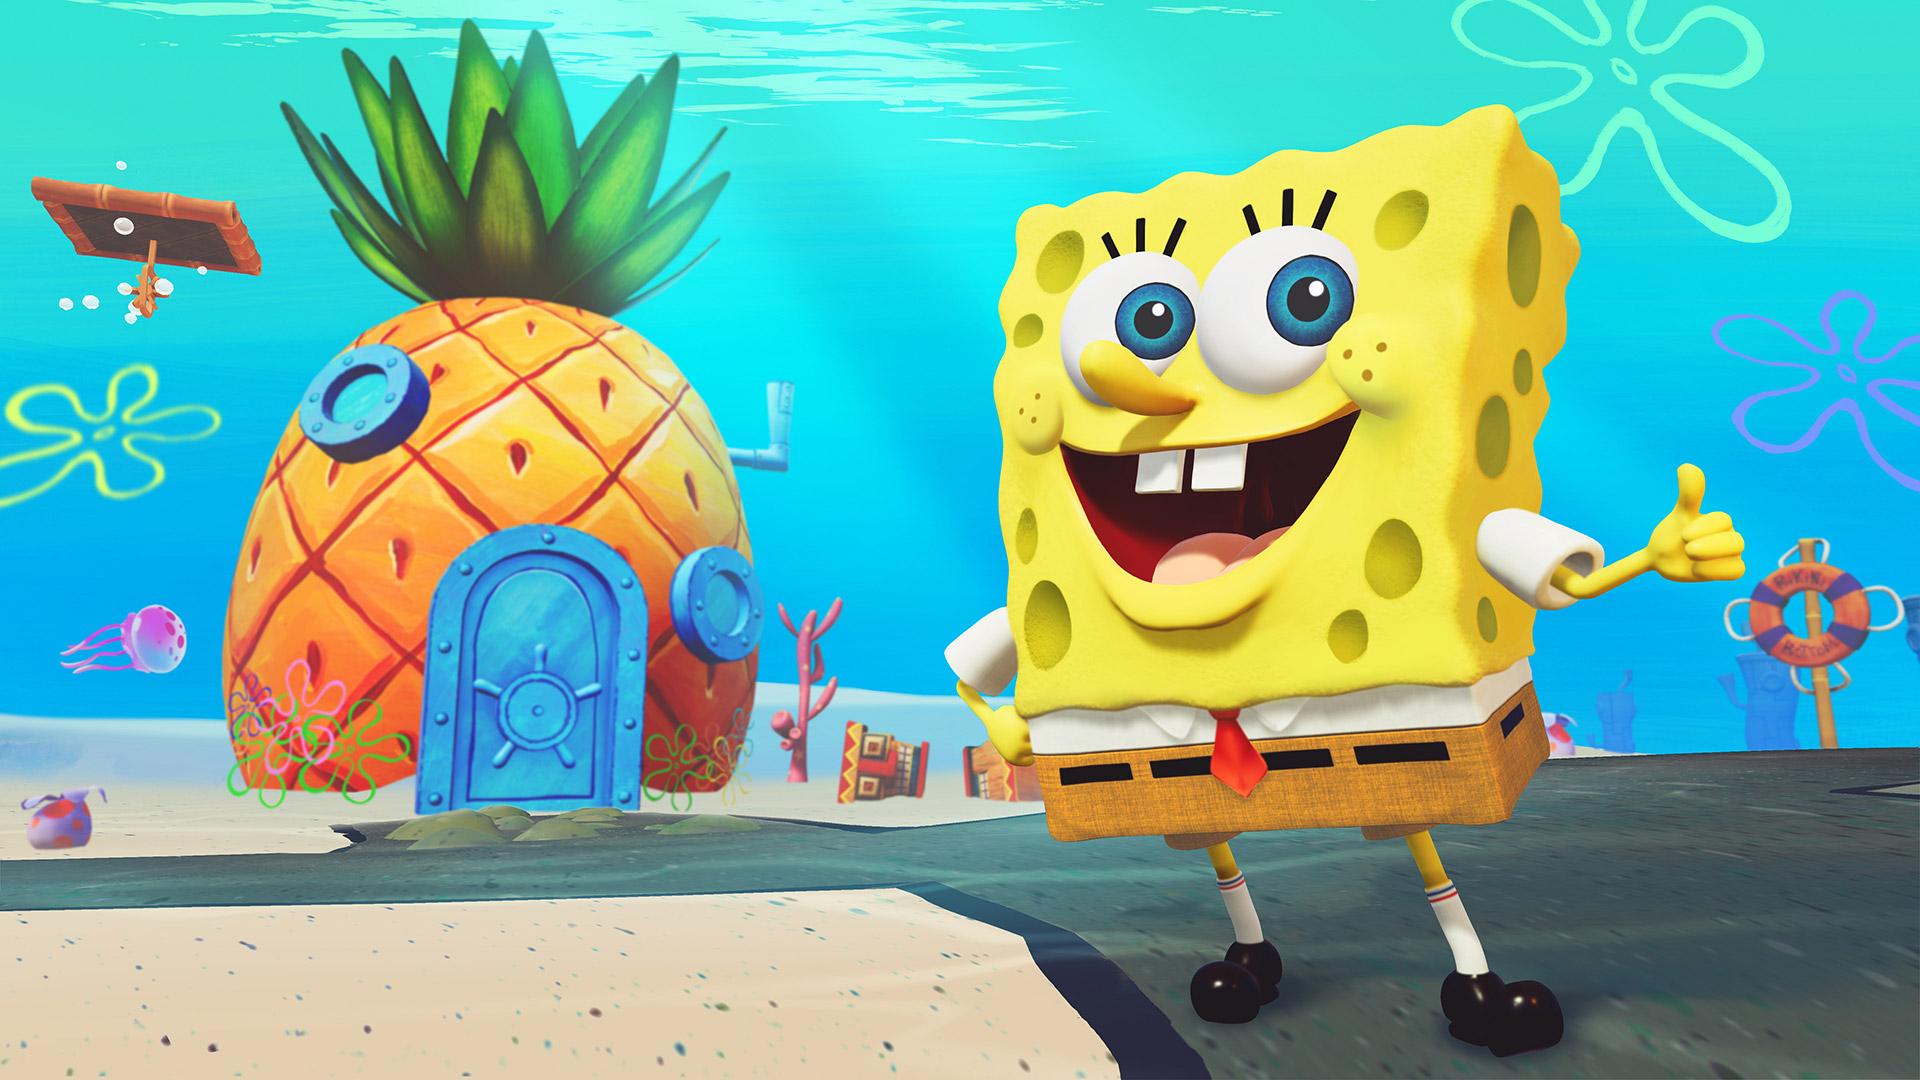 Free SpongeBob SquarePants: Battle for Bikini Bottom Wallpaper in 1920x1080